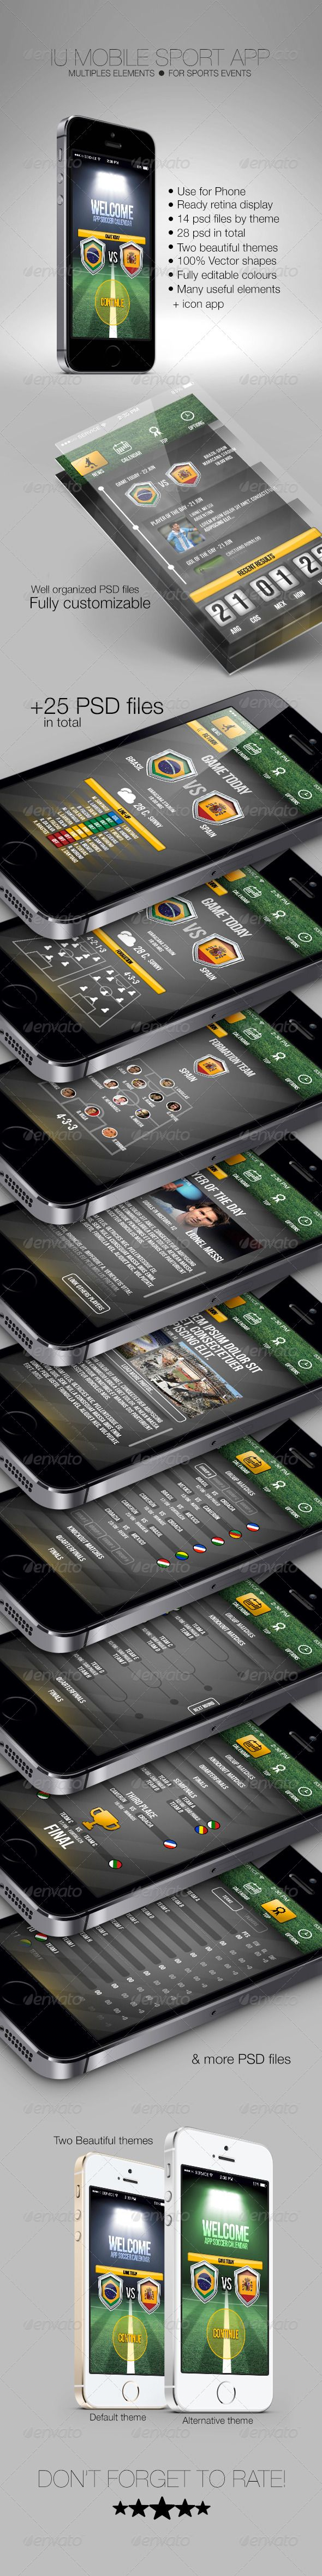 Free IU Mobile Sport App. Link: http://graphicriver.net/item/iu-mobile-sport-app-/7119395. [Link expires in a month]